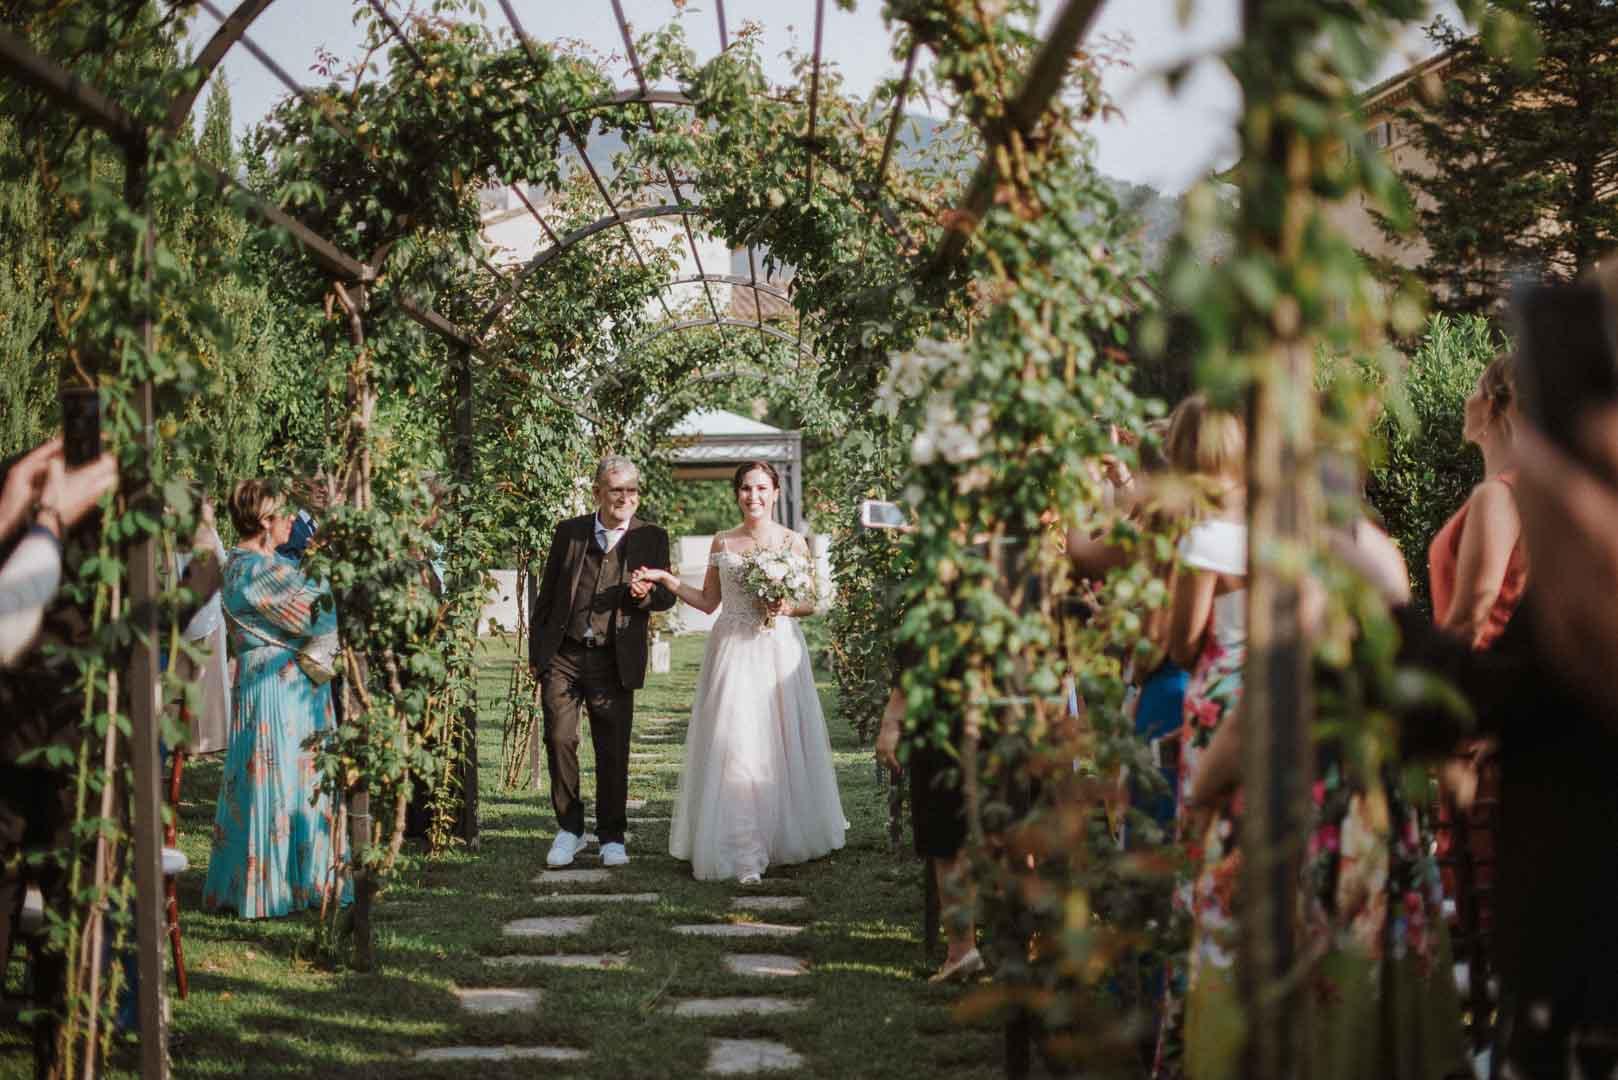 wedding-photographer-destination-fineart-bespoke-reportage-tuscany-villascorzi-vivianeizzo-spazio46-64